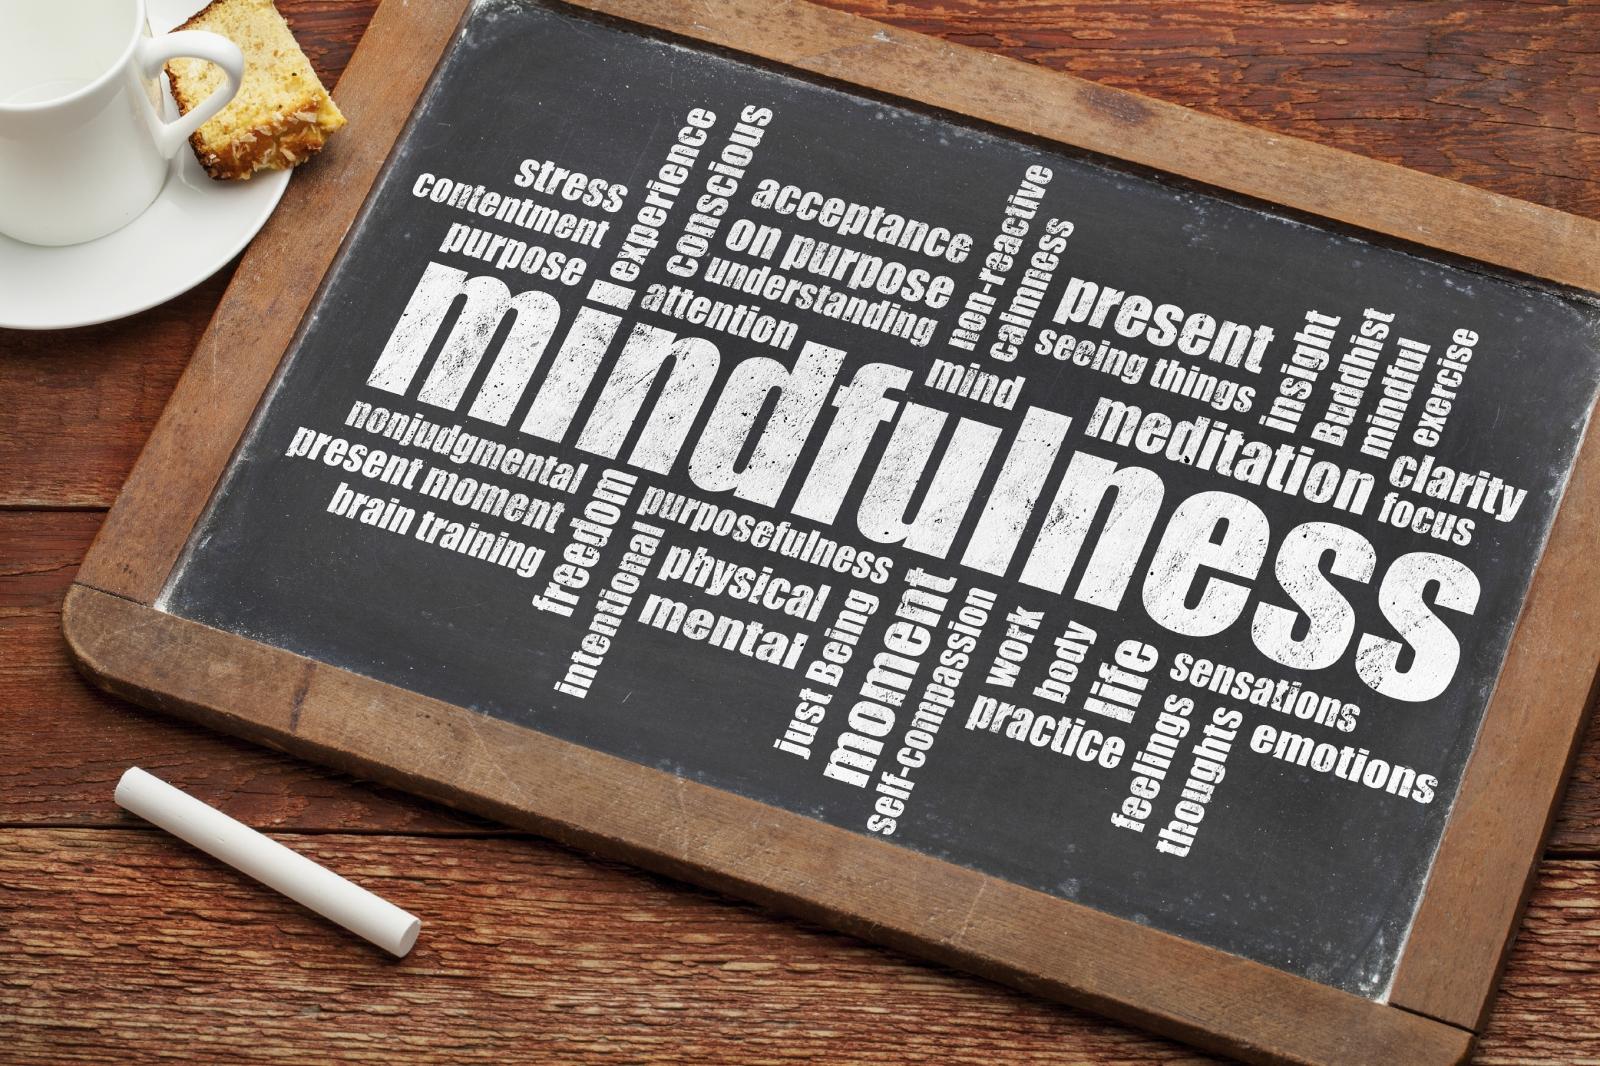 mindfulness depression treatment